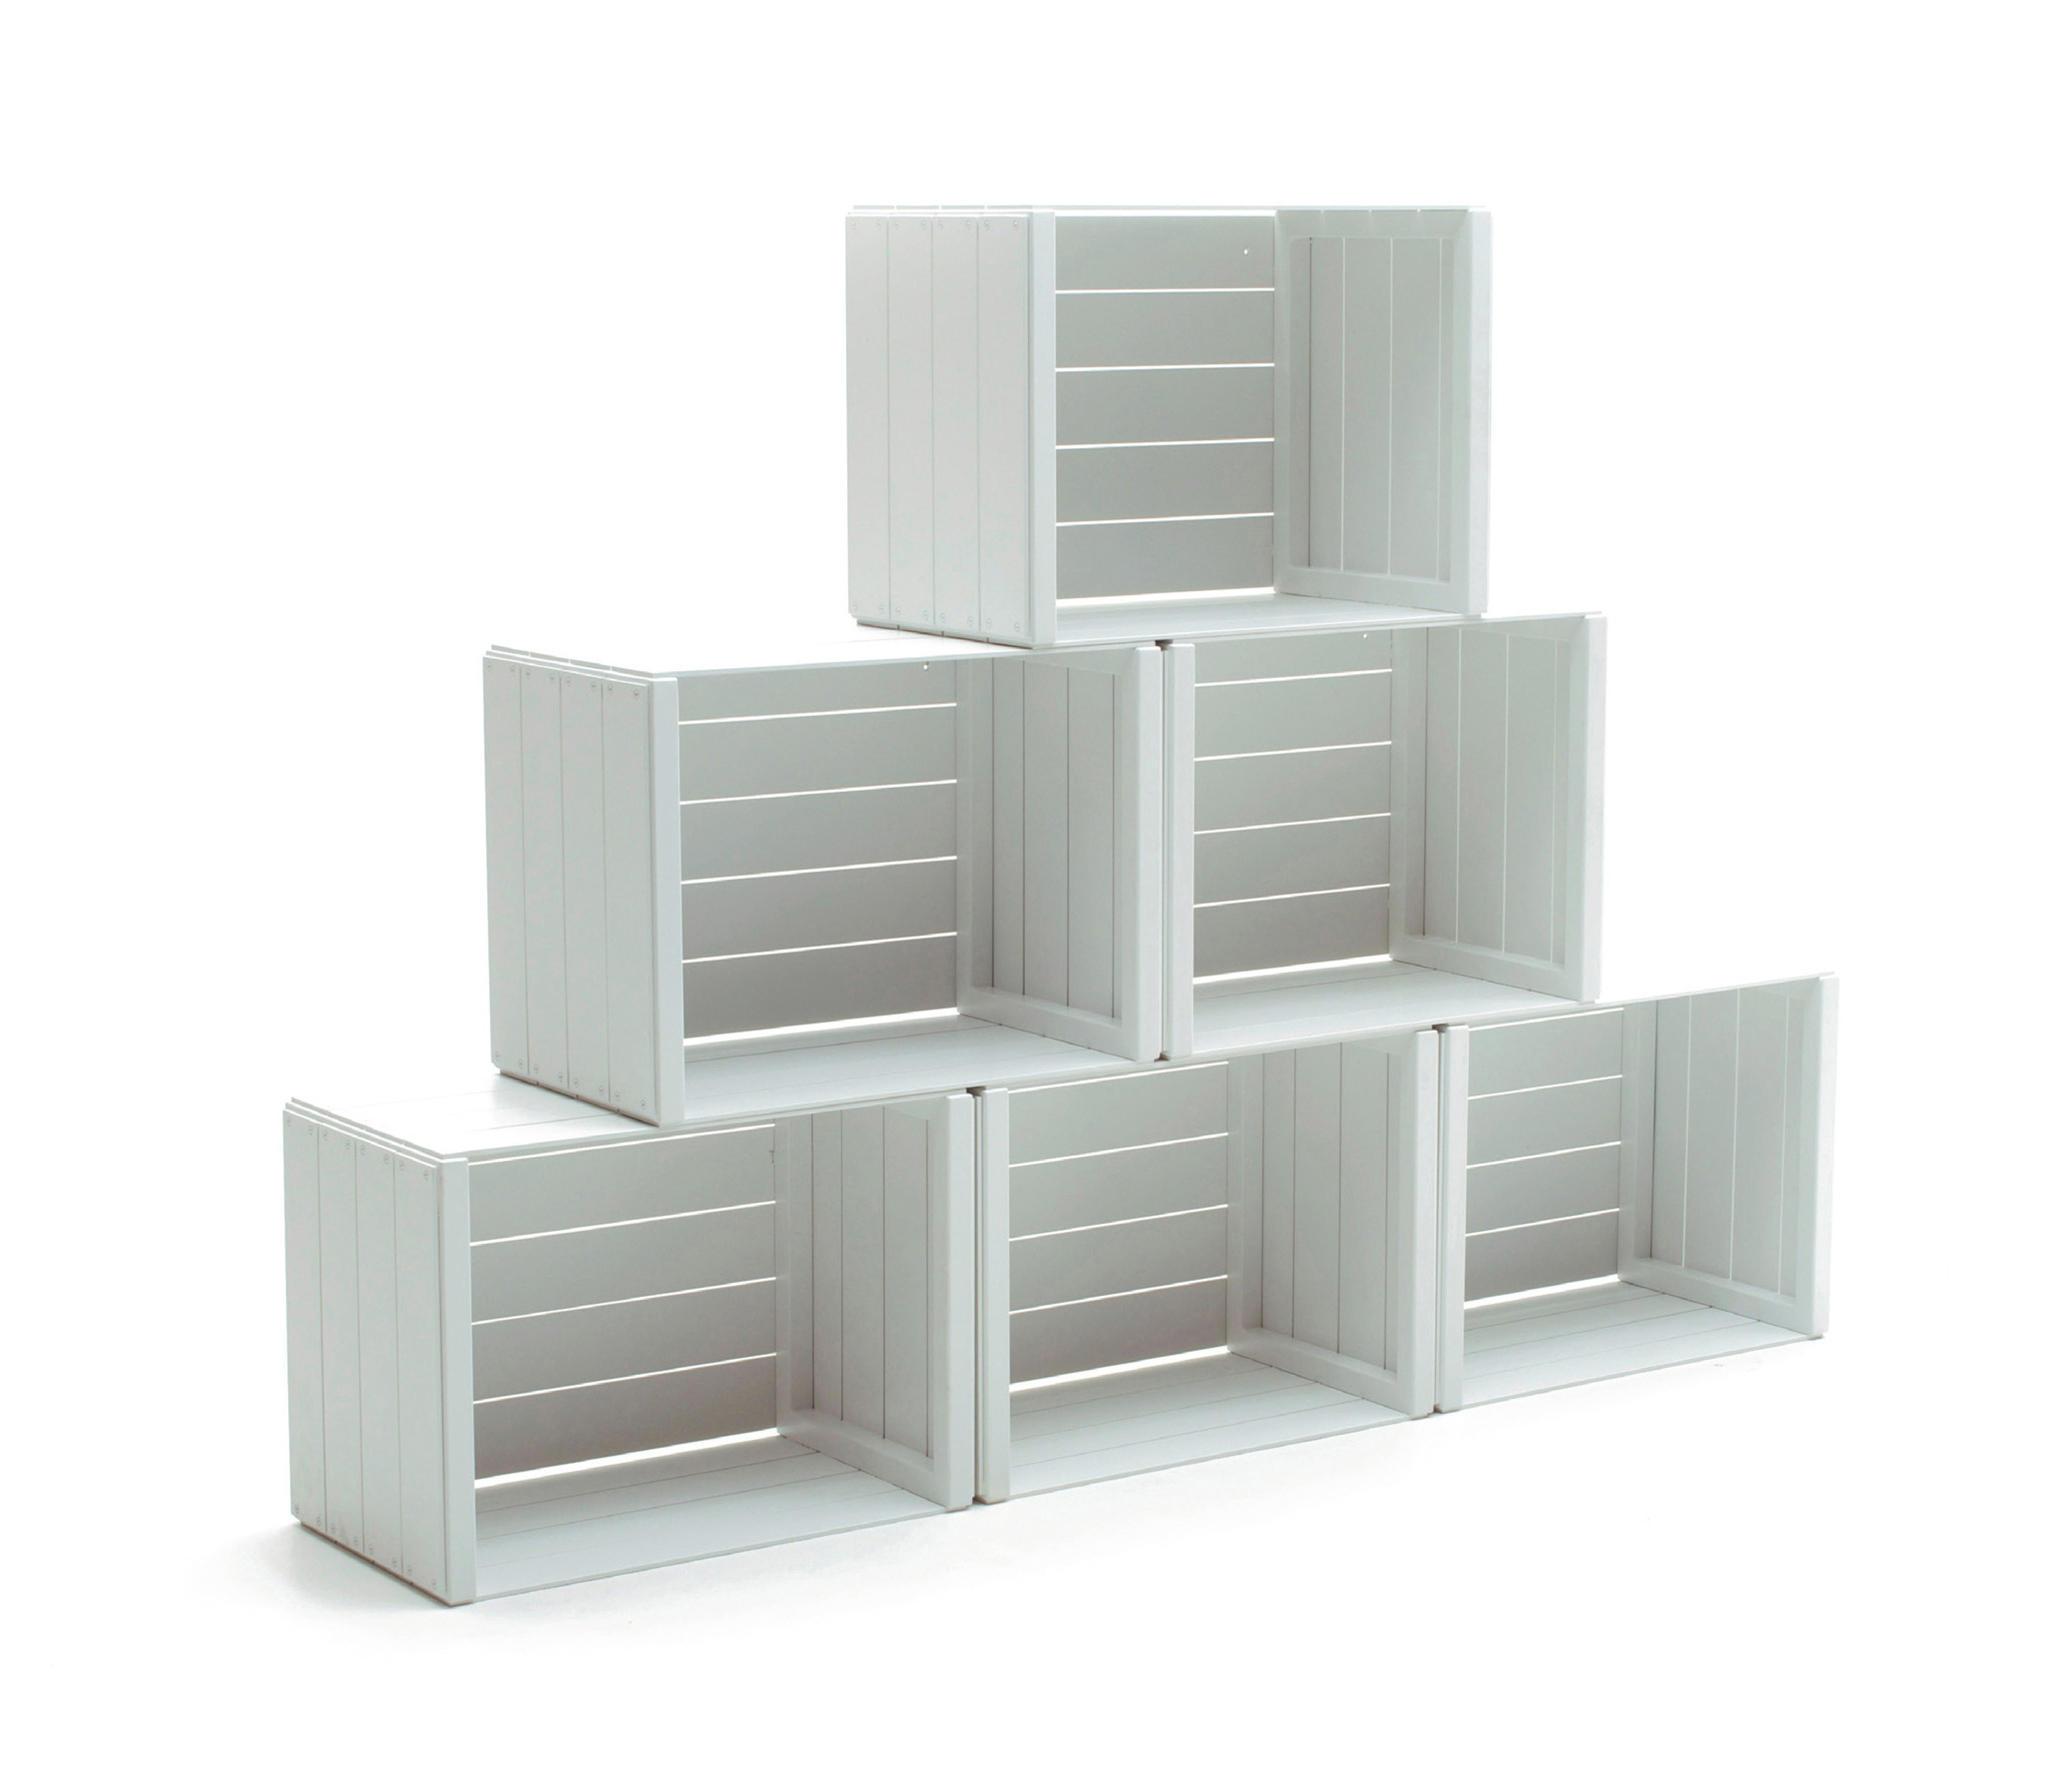 units storage system regalmodule von varaschin architonic. Black Bedroom Furniture Sets. Home Design Ideas